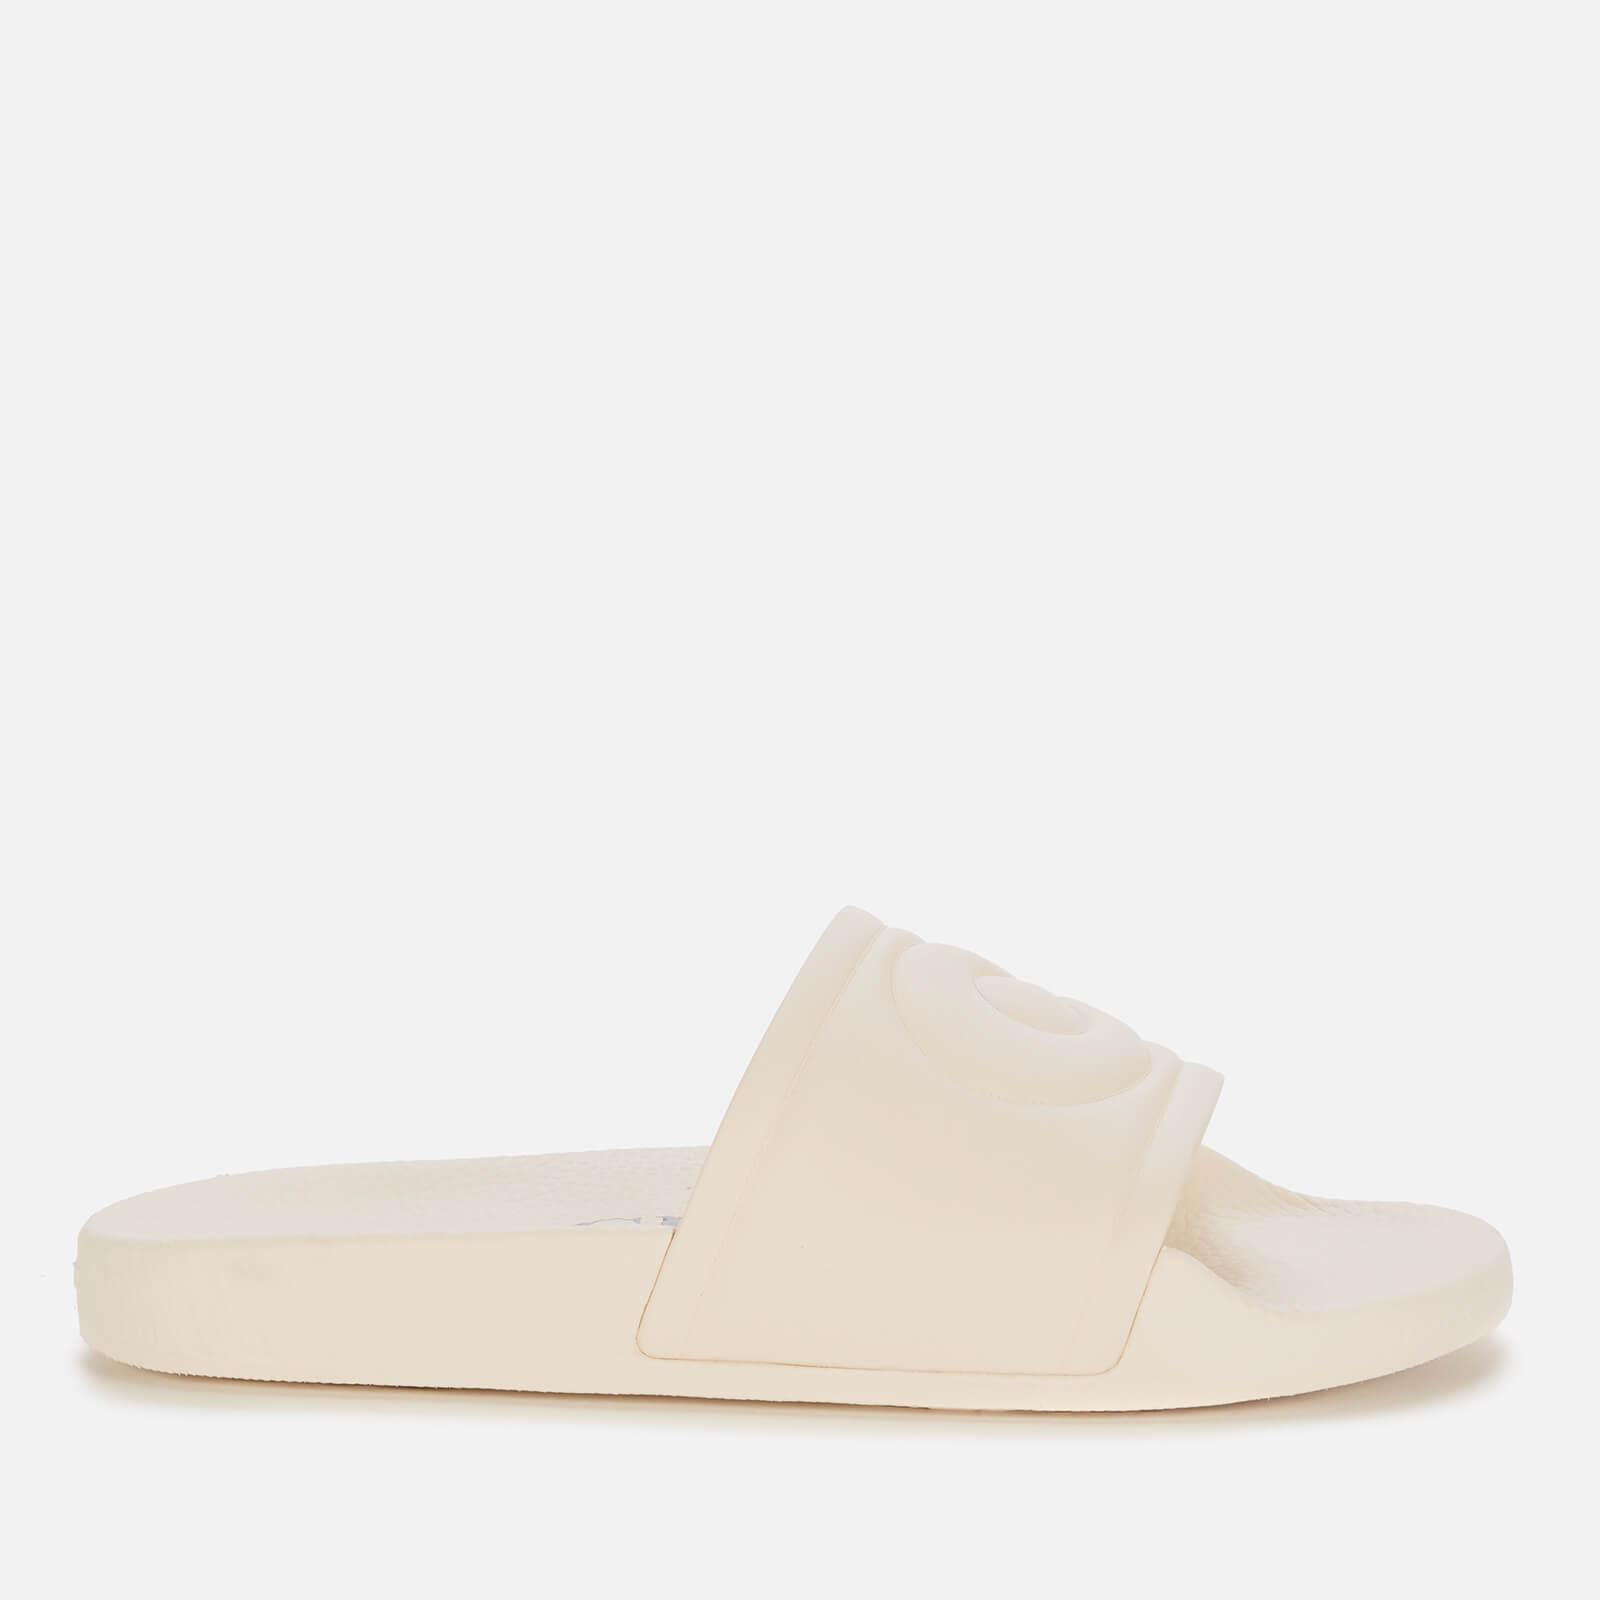 Coach Women's Ula Rubber Slide Sandals - Chalk - Uk 3